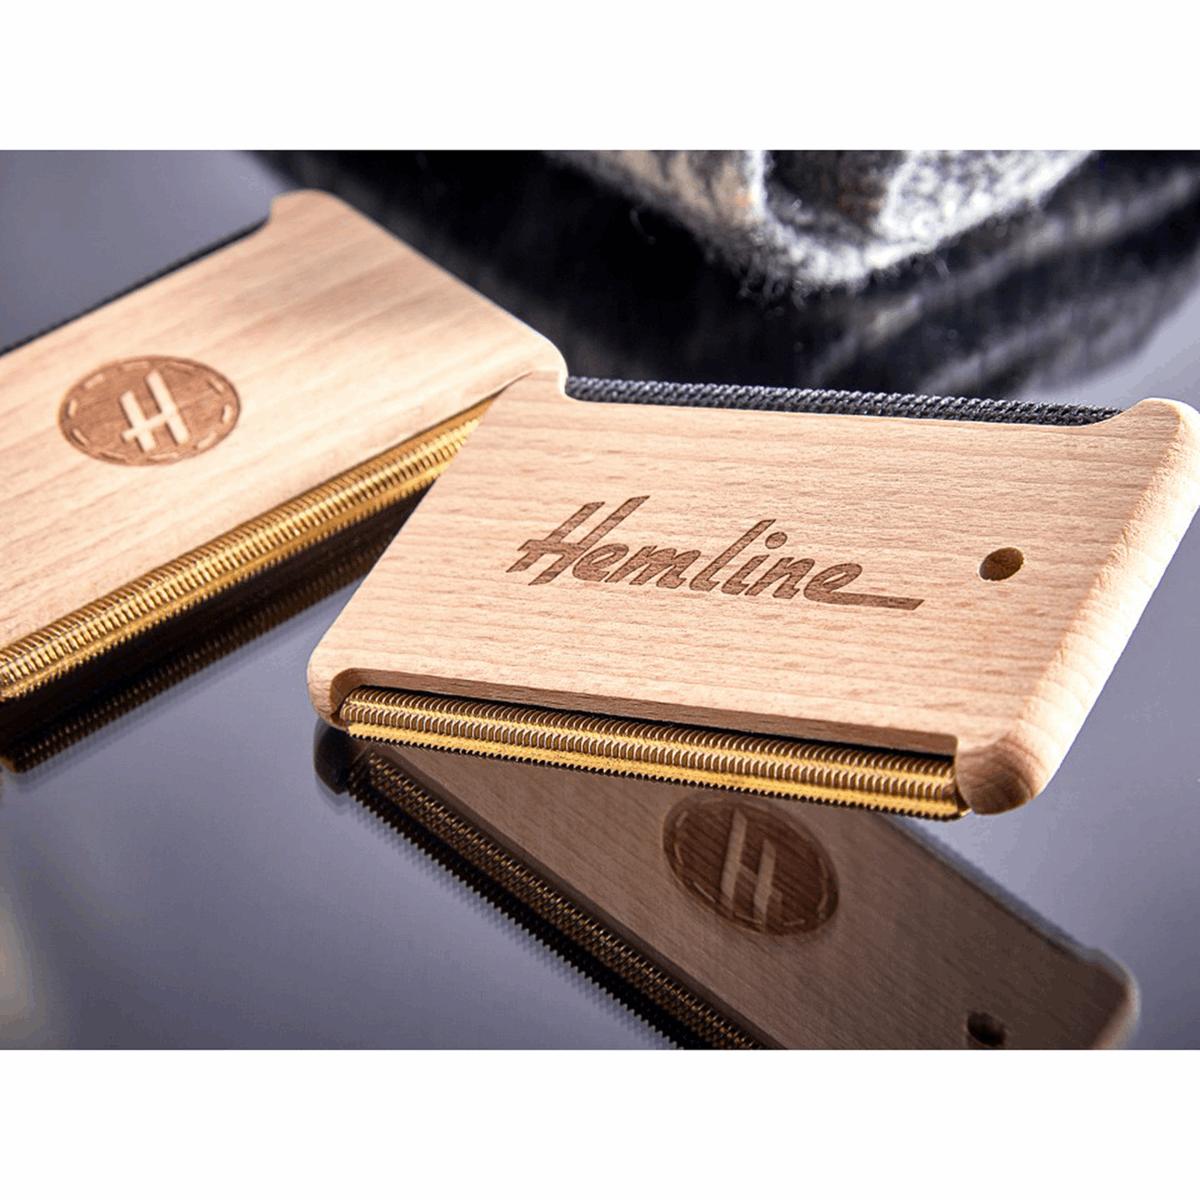 Hemline Fabric & Wool Comb...